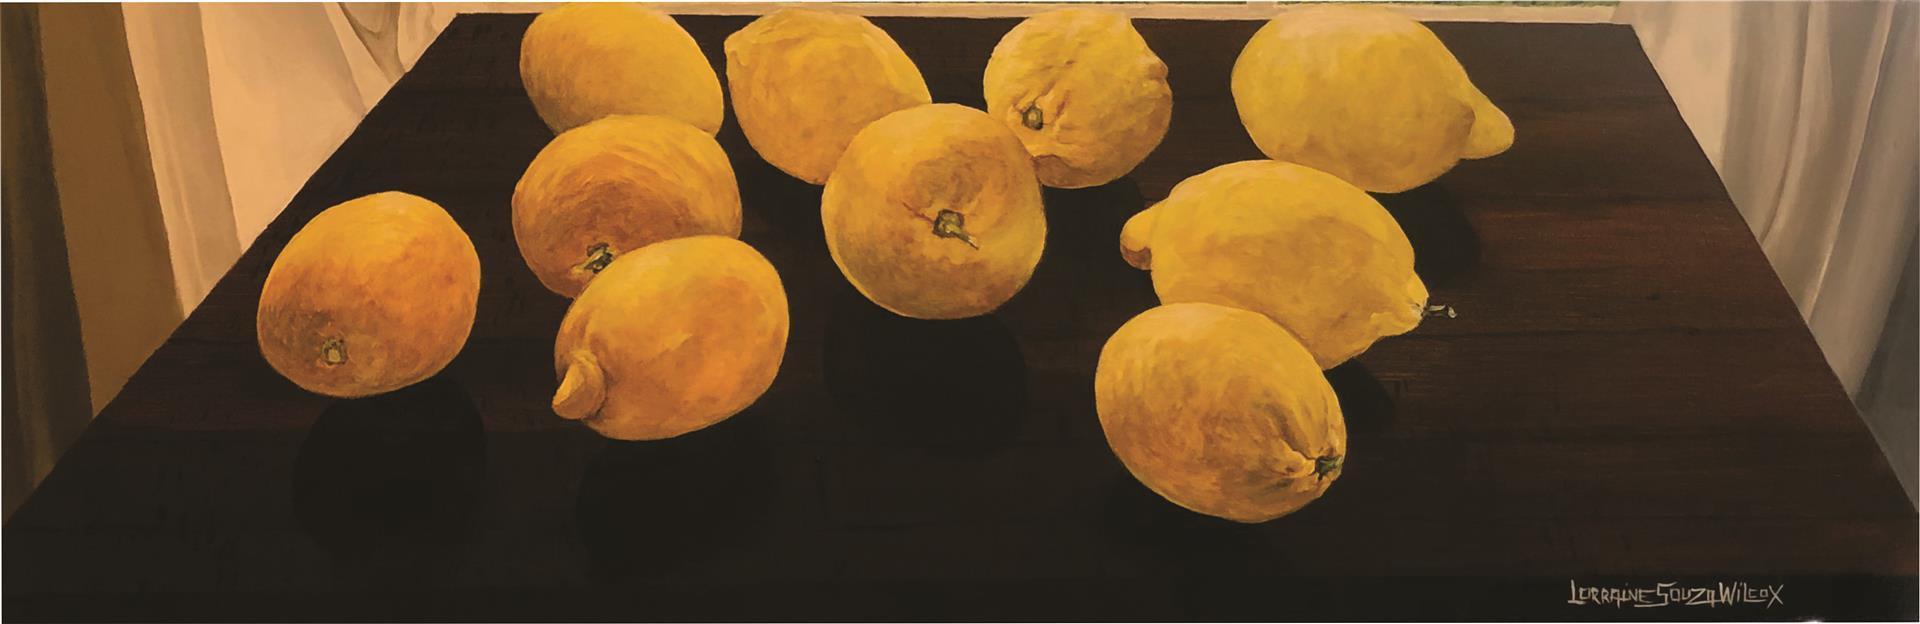 "Lorraine Wilcox (Turlock), Central Valley Lemons, 2020 Acrylic, 12"" x 36"" NFS"